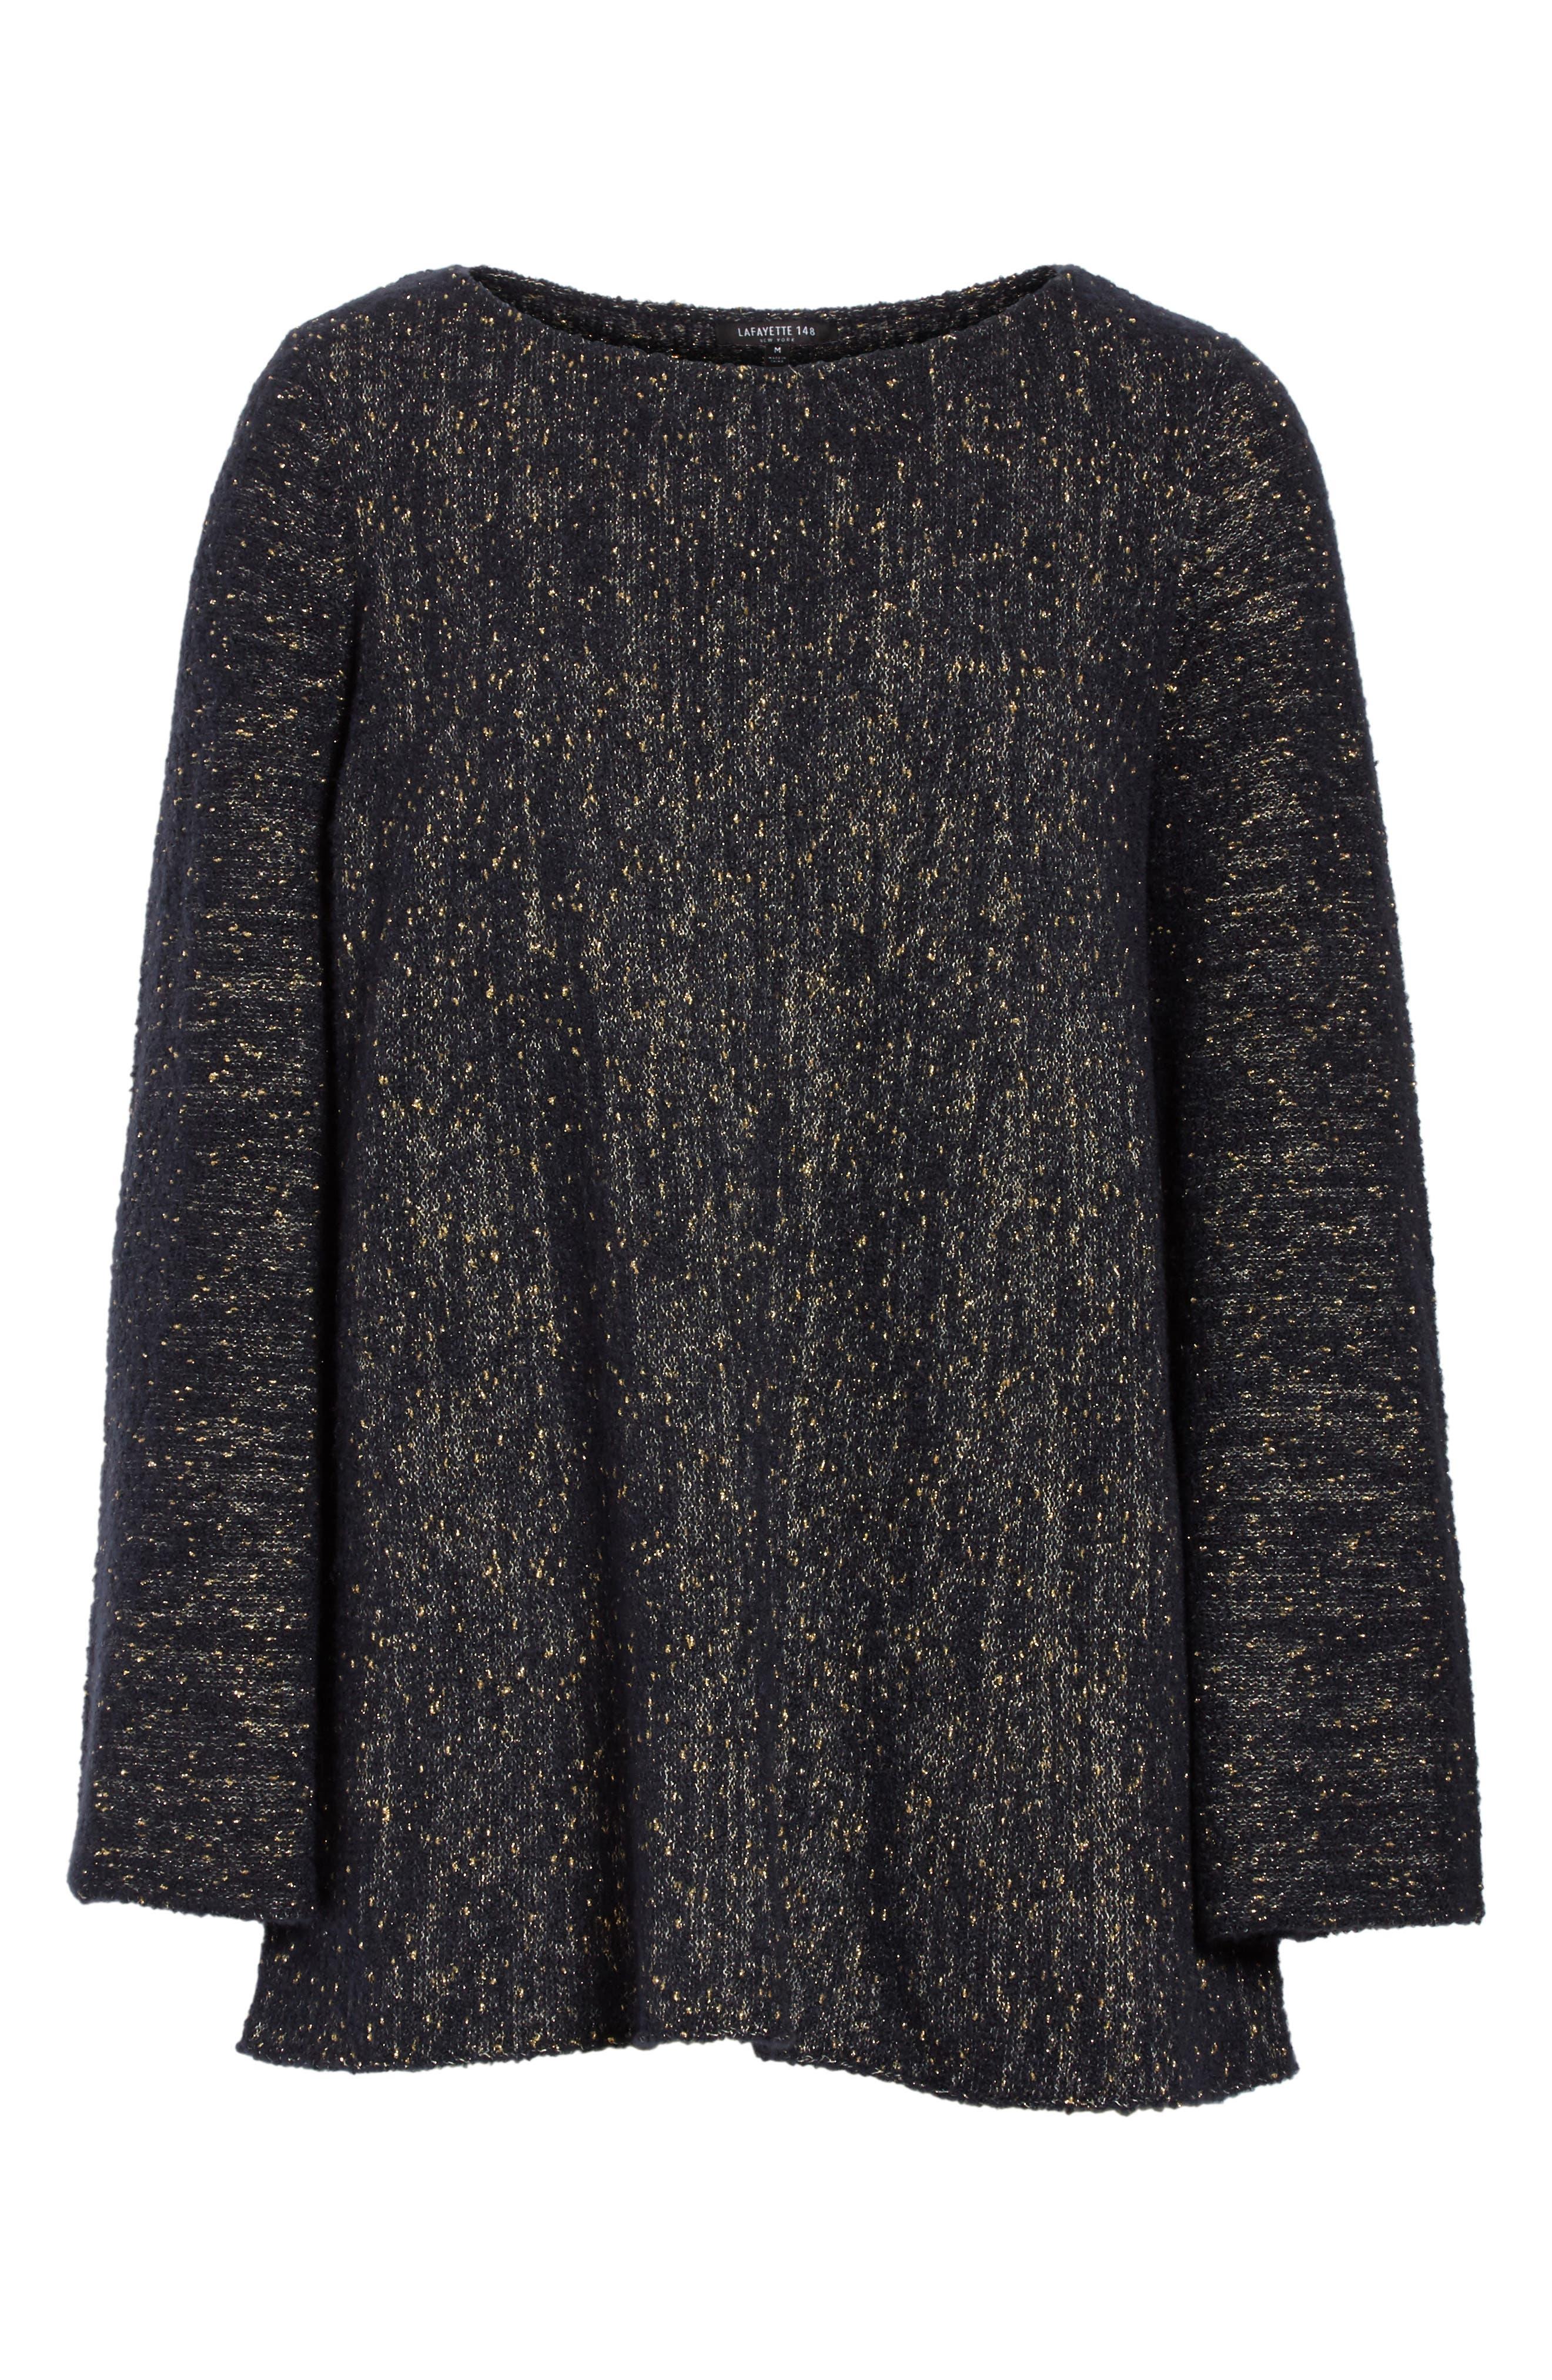 Lafayette Metallic Knit A-Line Sweater,                             Alternate thumbnail 6, color,                             Ink Metallic